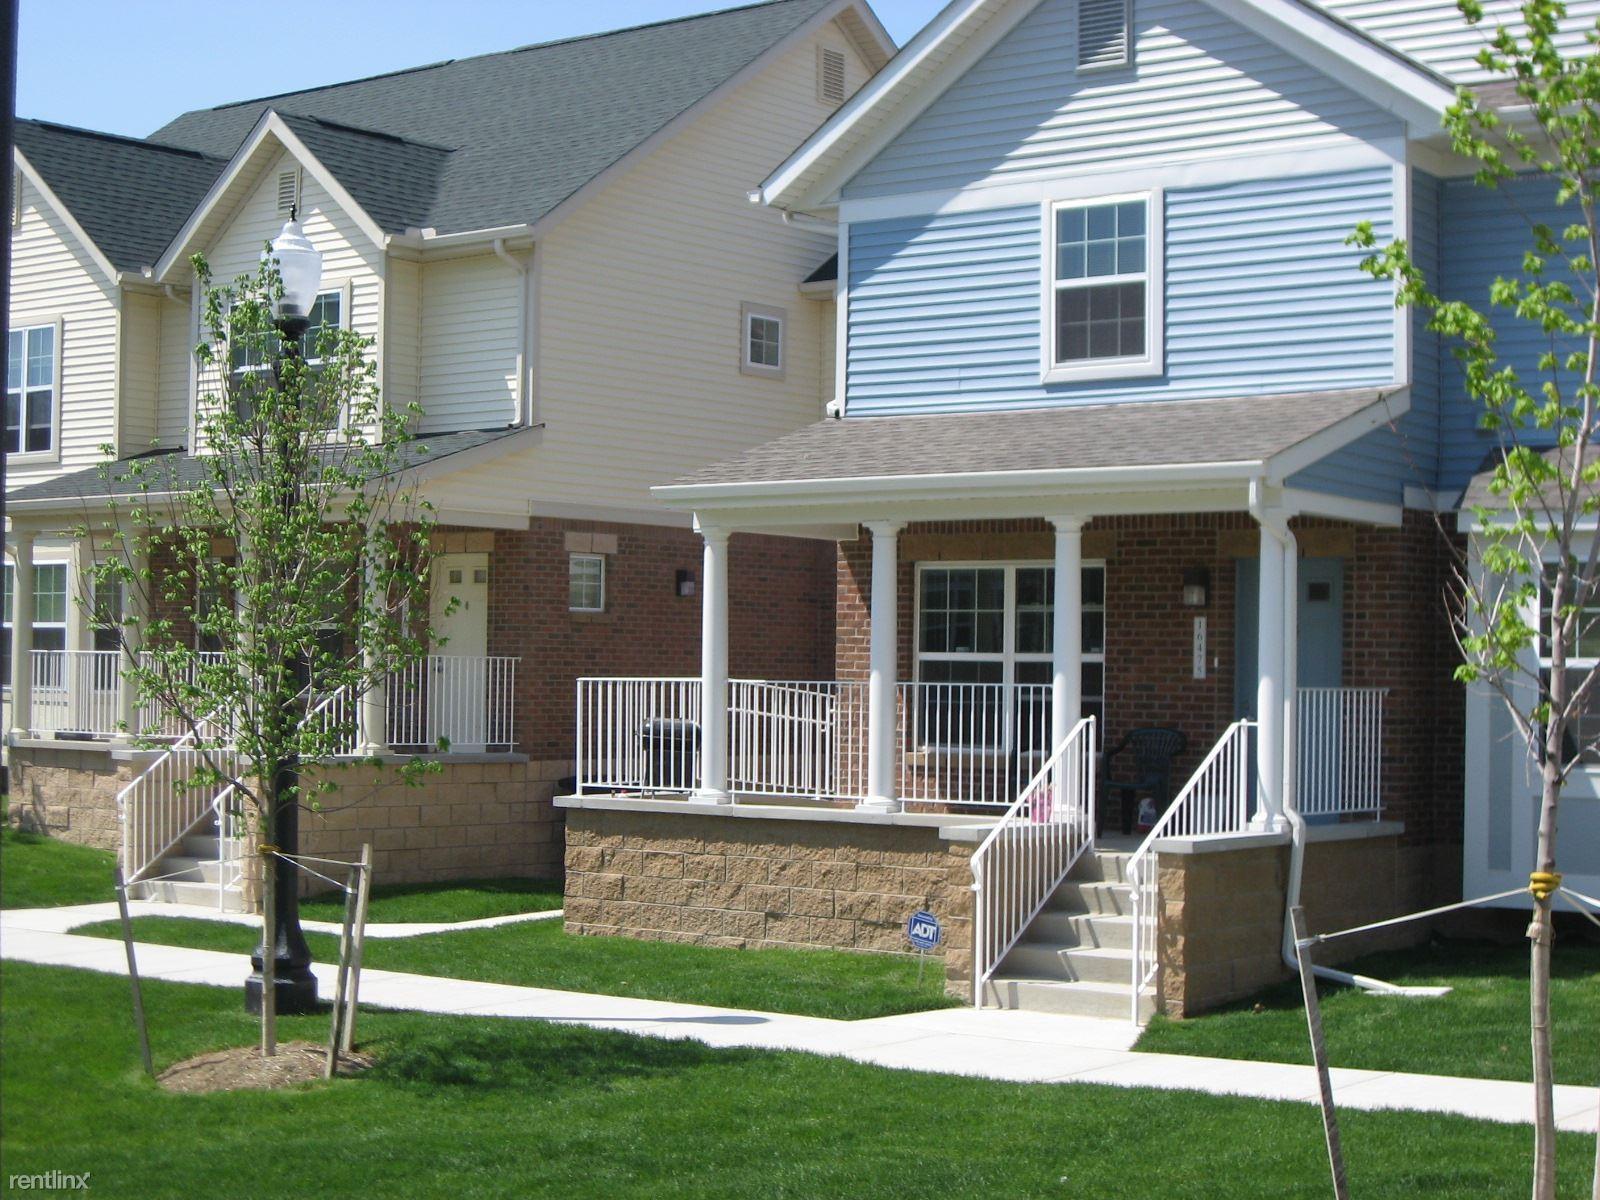 Gardenview Estates 13699 13601 Van Buren St Detroit Mi 48228 Apartment For Rent Padmapper